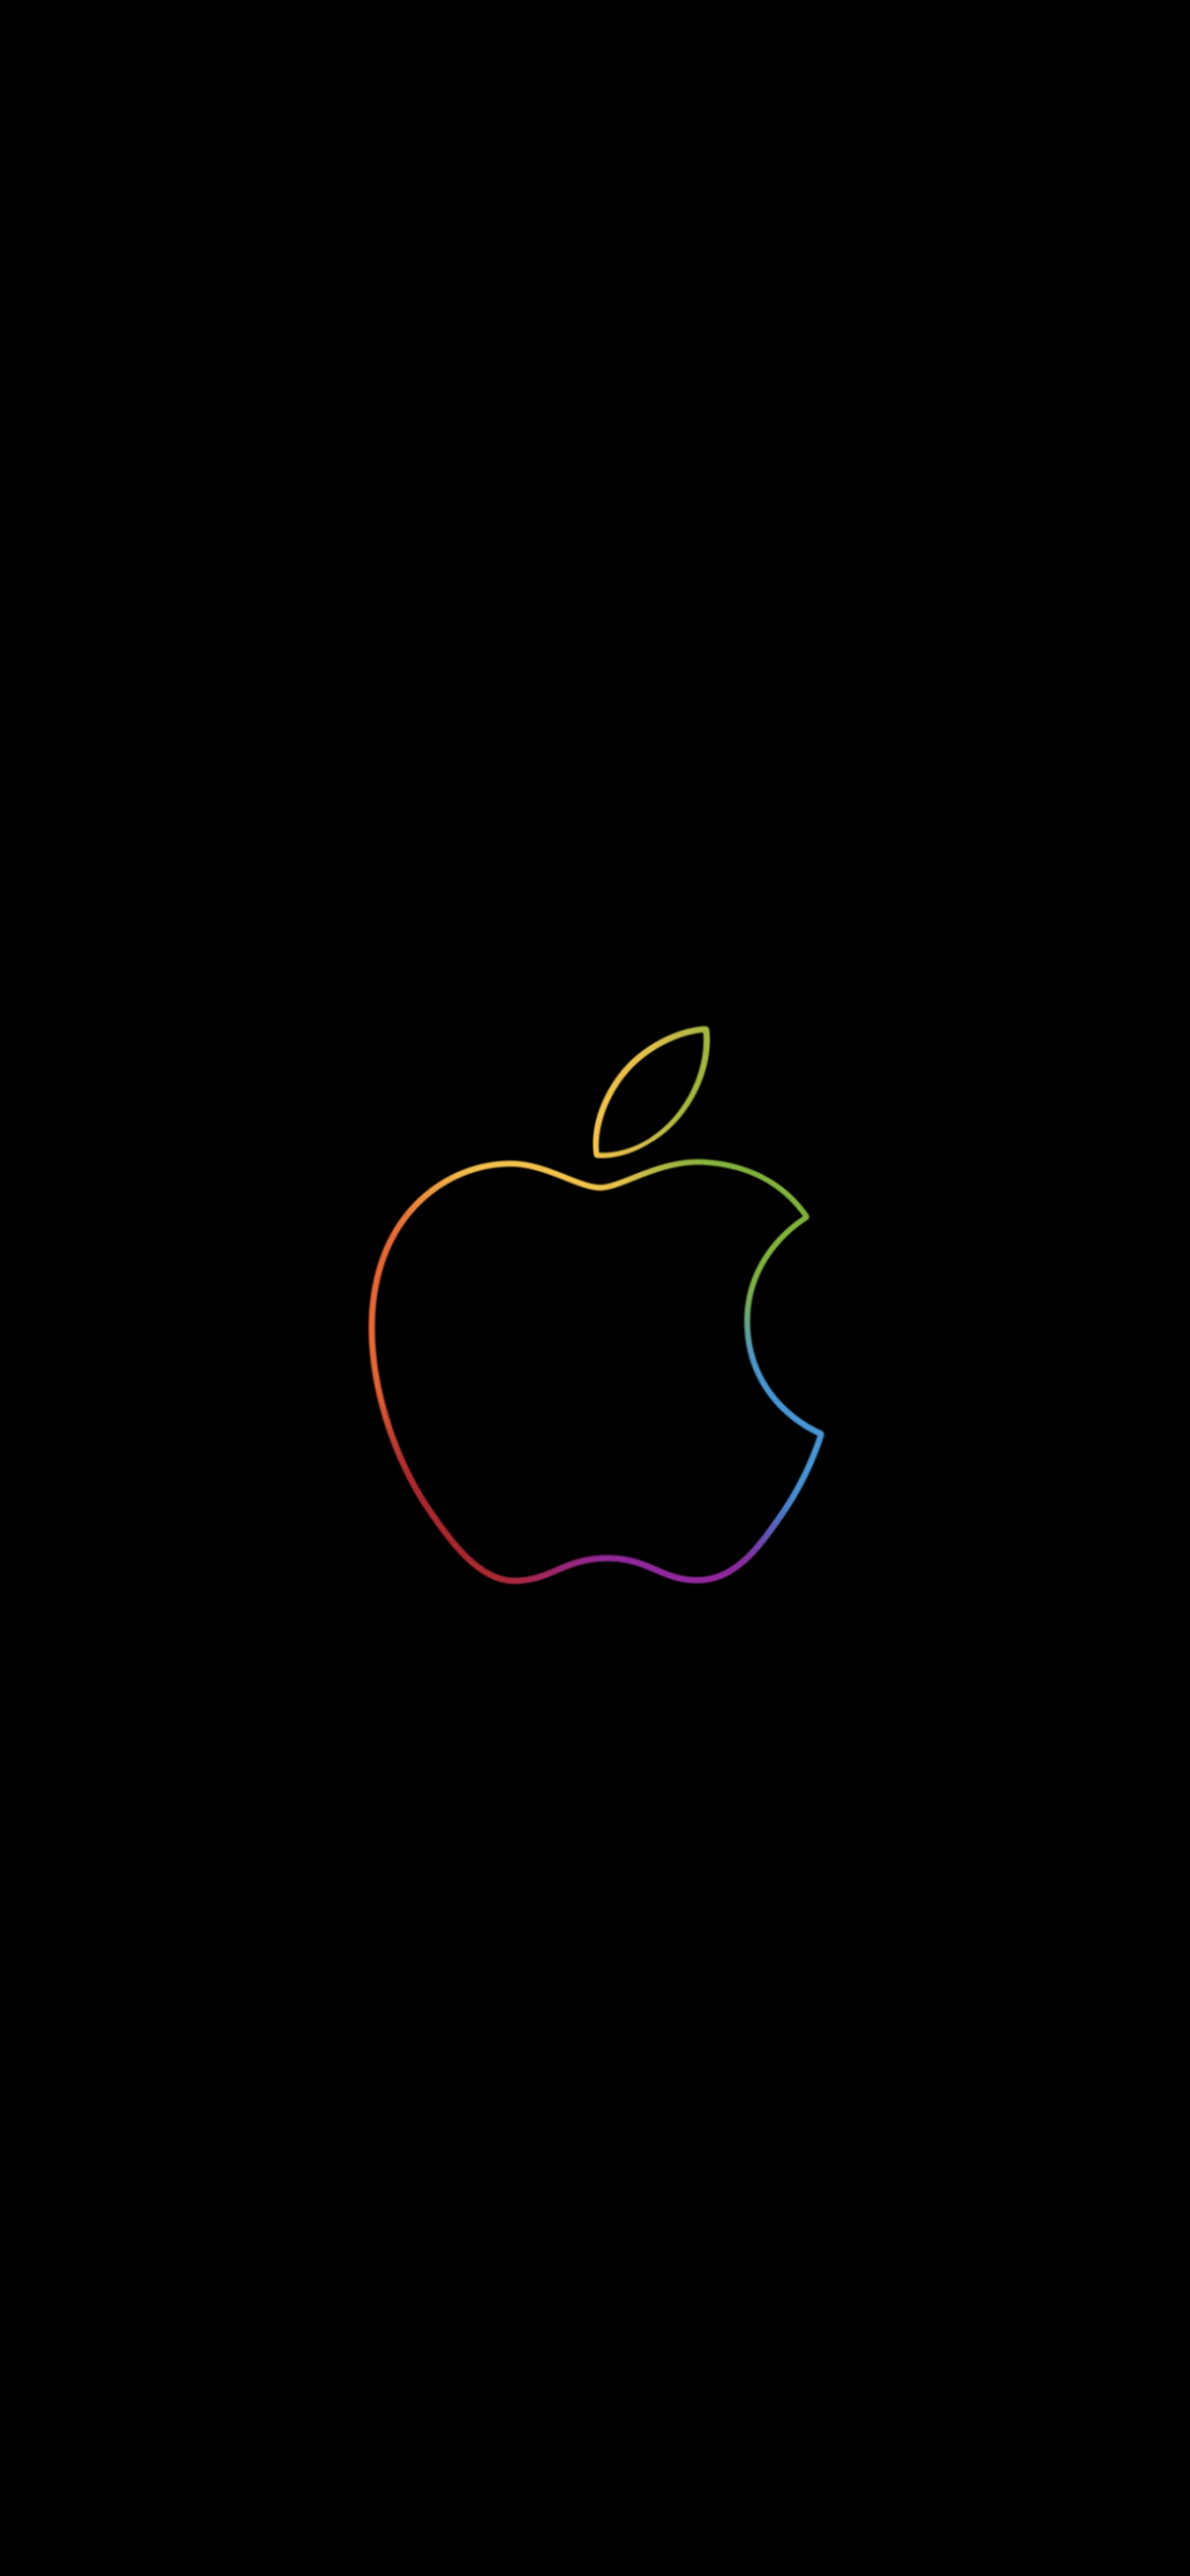 Apple Logo 4k Wallpaper Colorful Outline Black Background Ipad Hd Technology 789